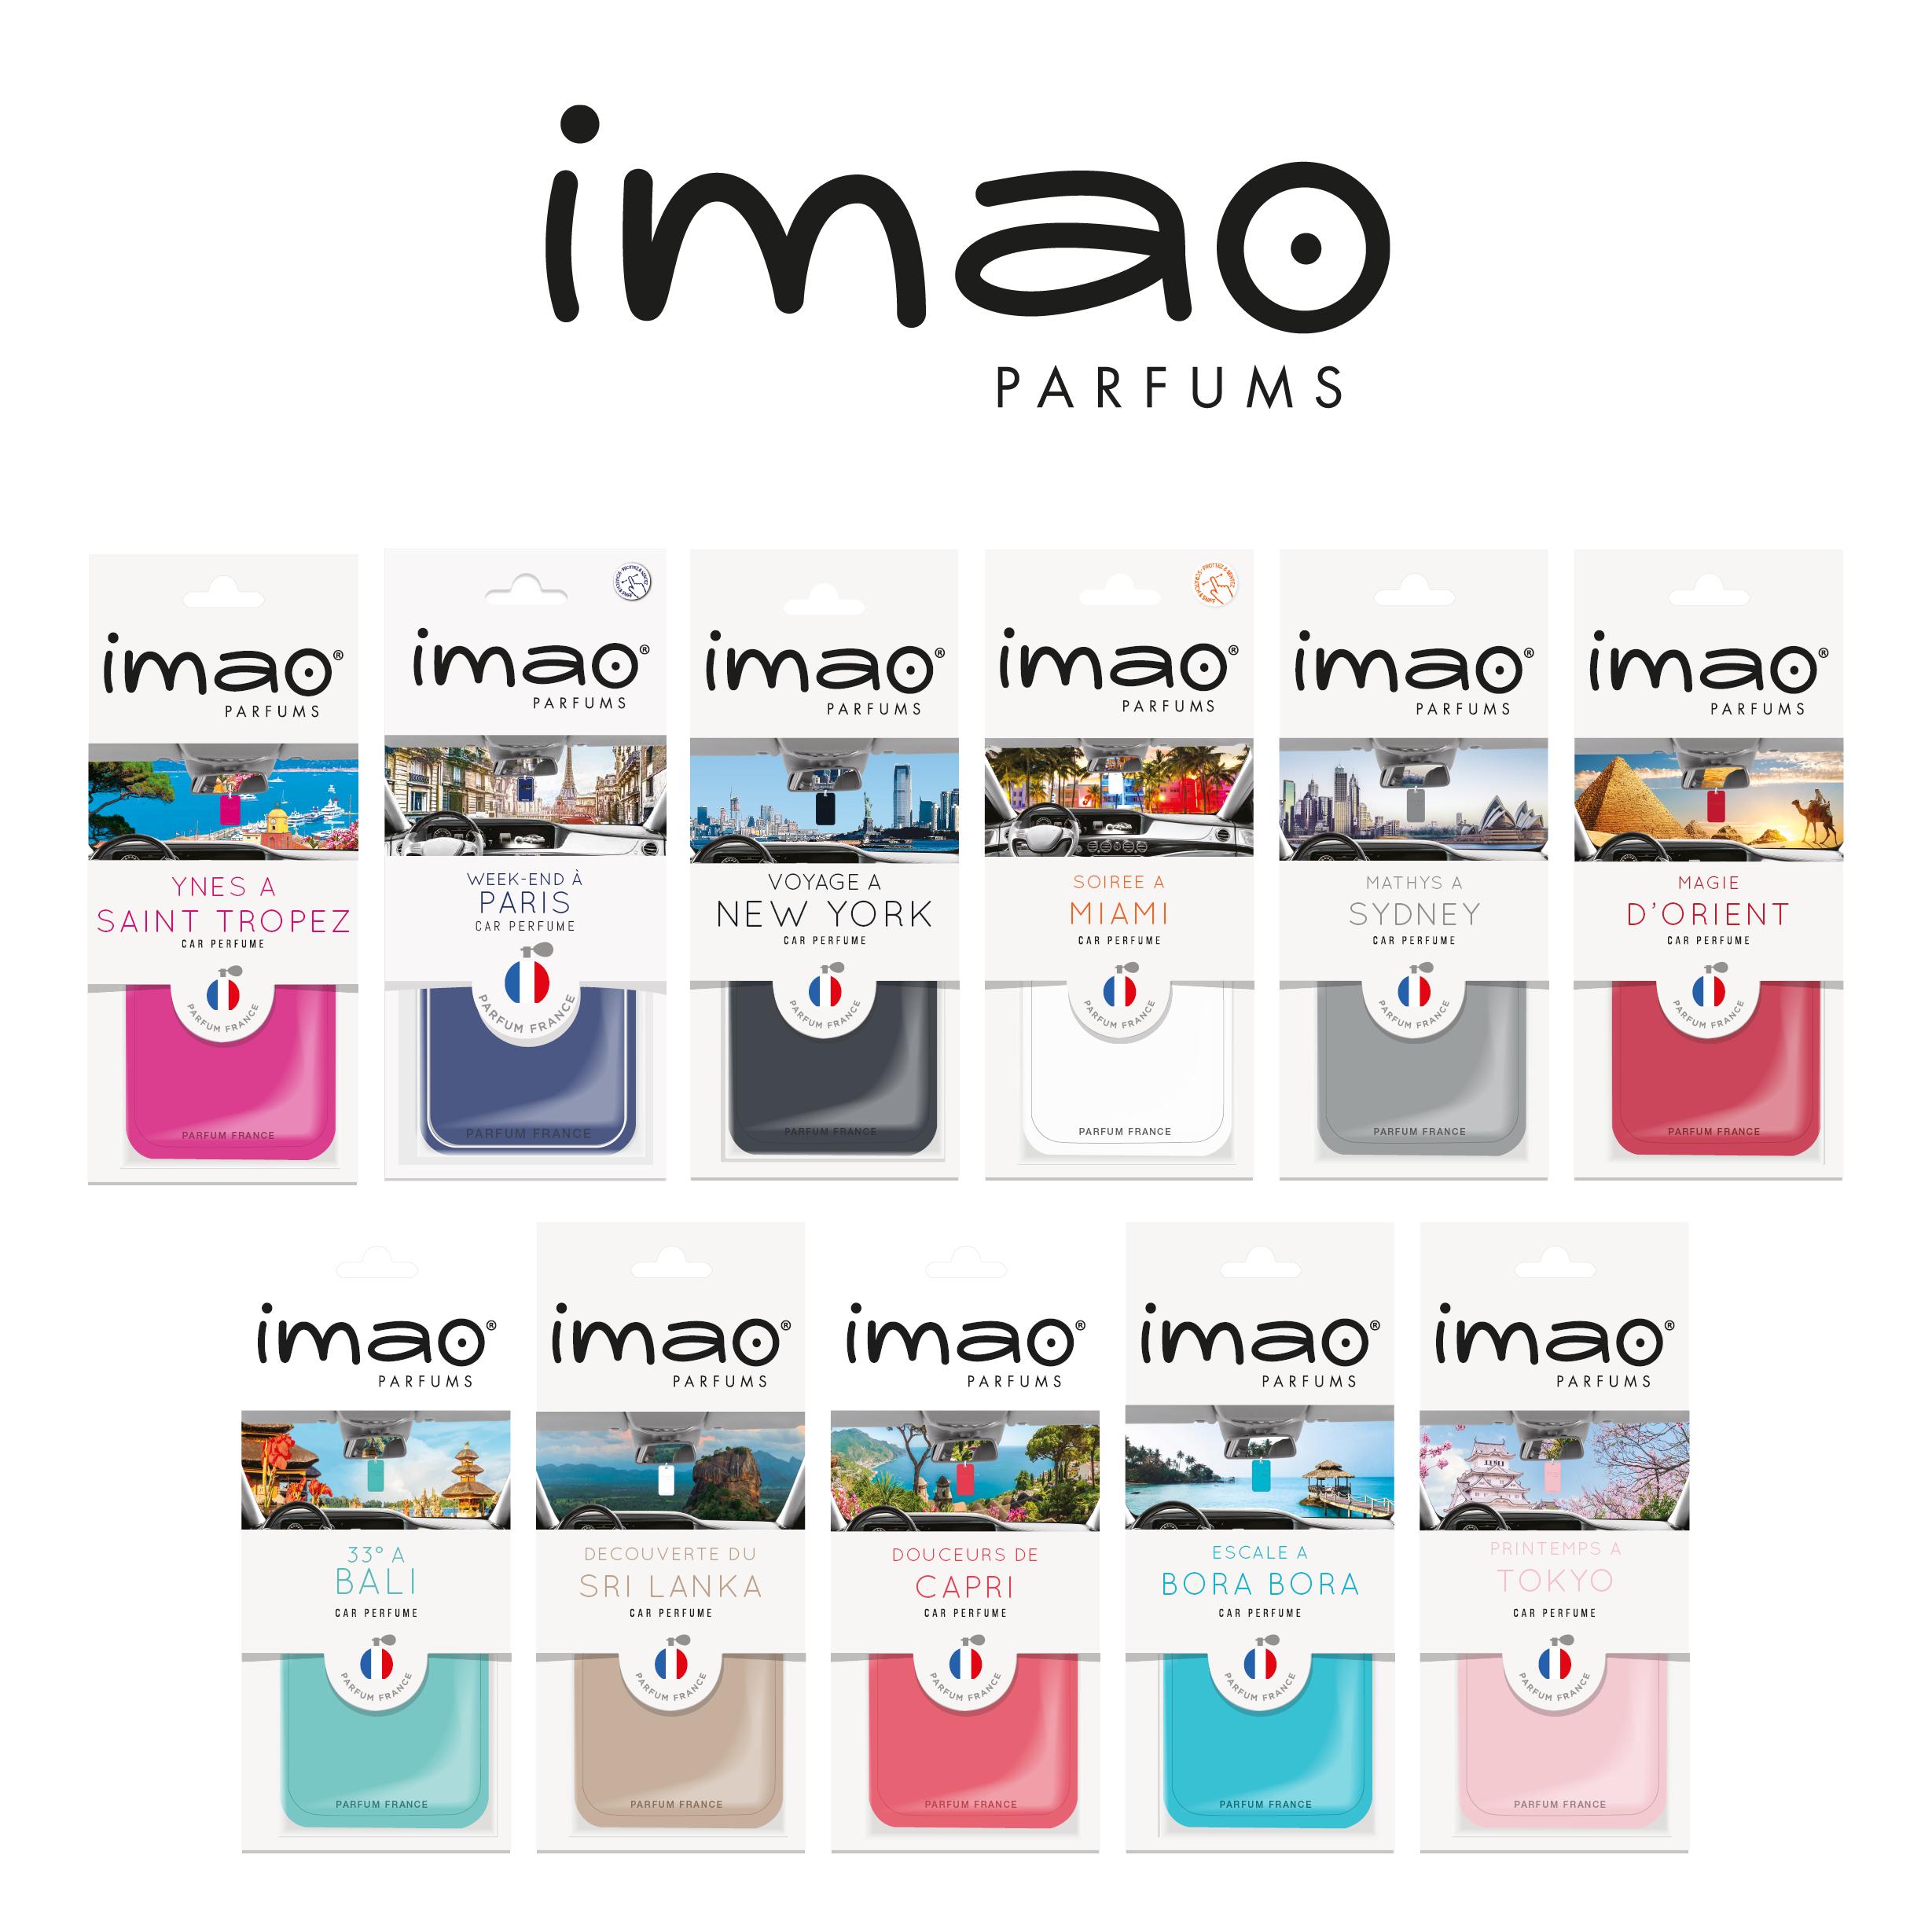 IMAO Parfums